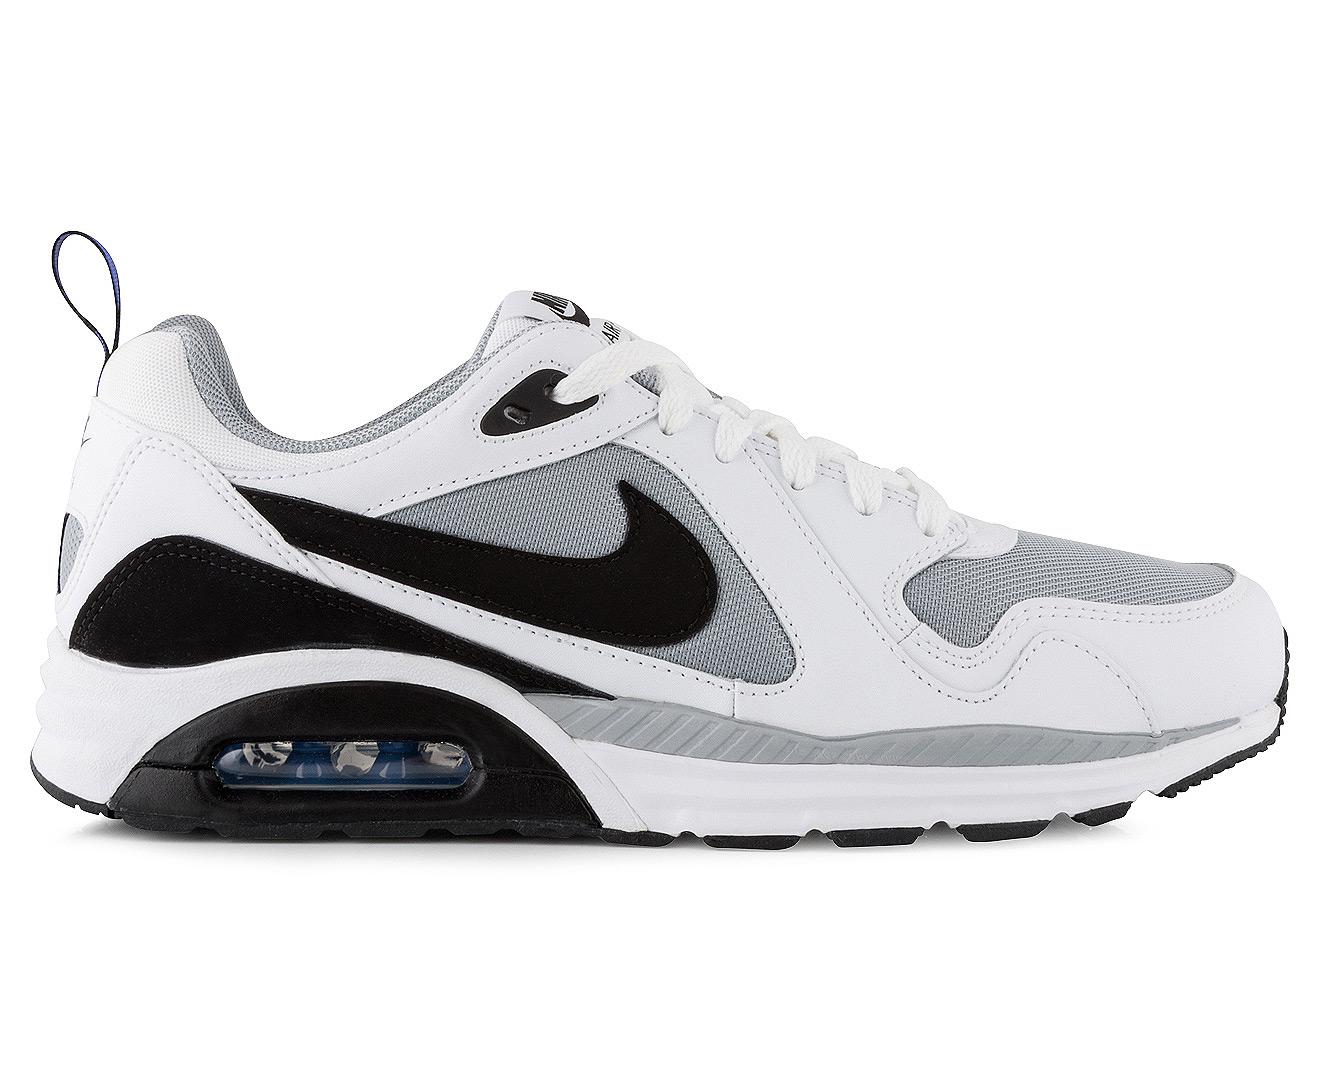 Nike 652824 100 Air Max Trax Leather Herren Sportschuhe Running 124KCIMGI